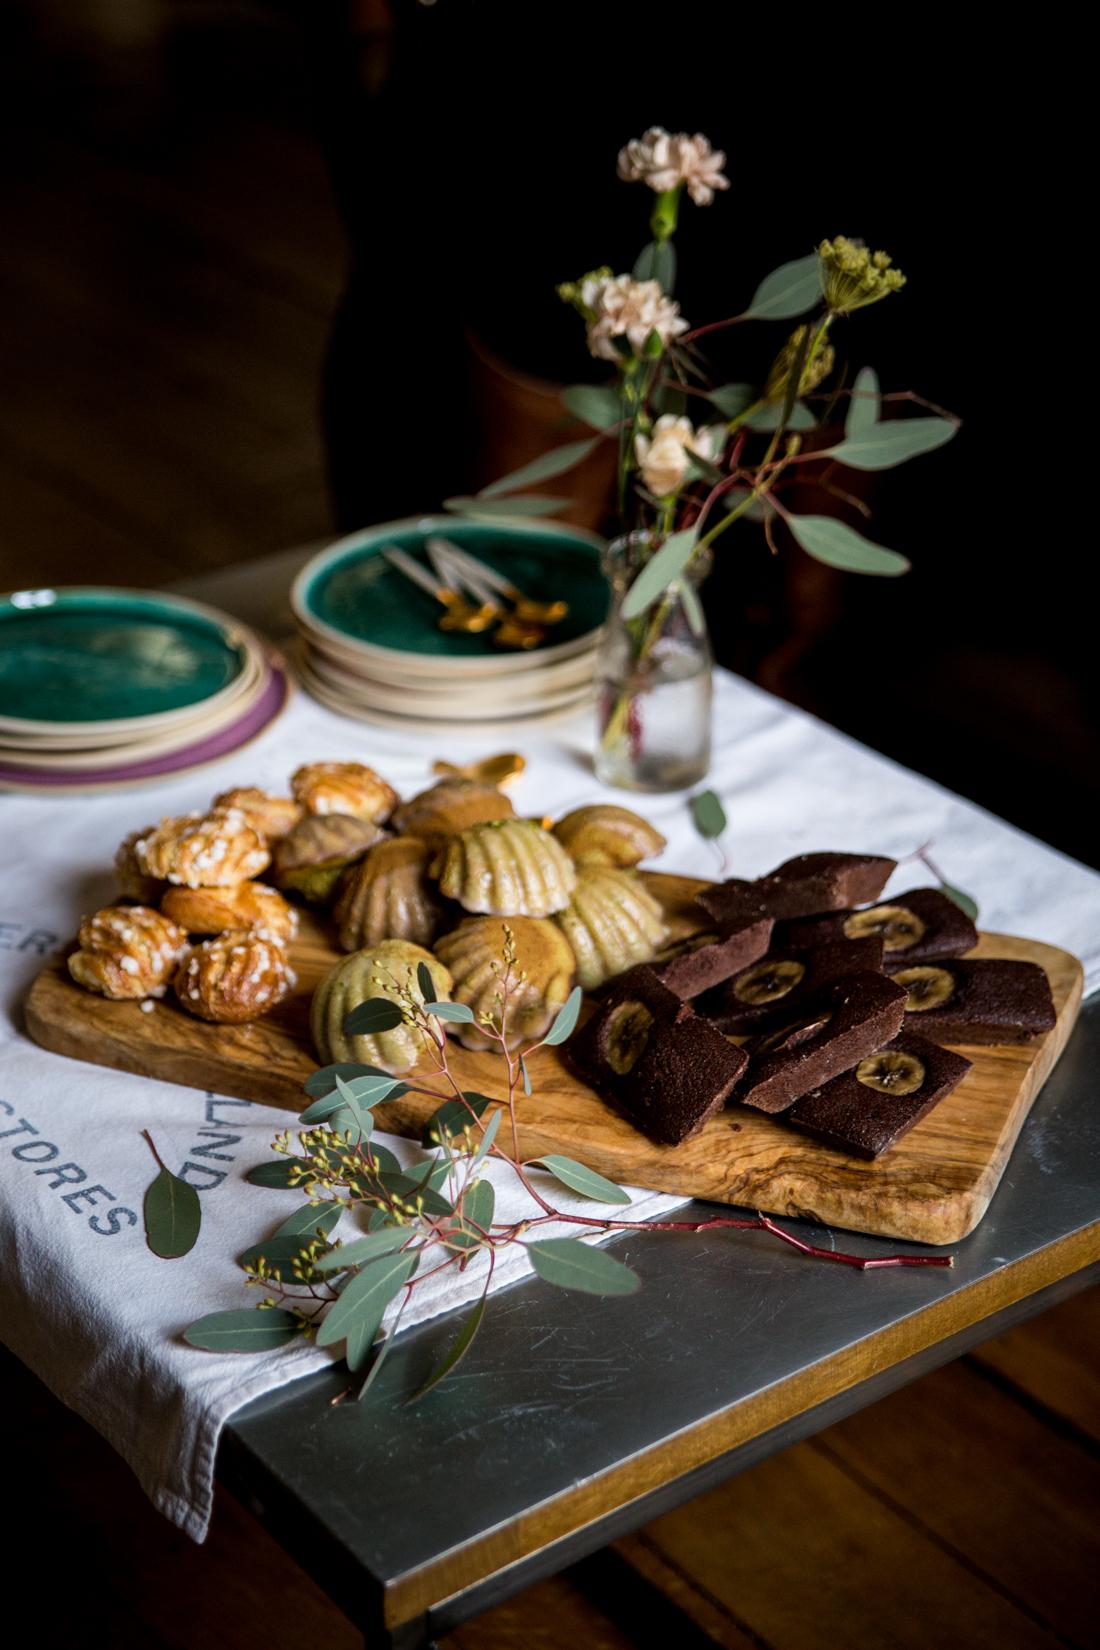 madeleines-au-the-matcha-et-glacage-au-citron-vert-ophelies-kitchen-book